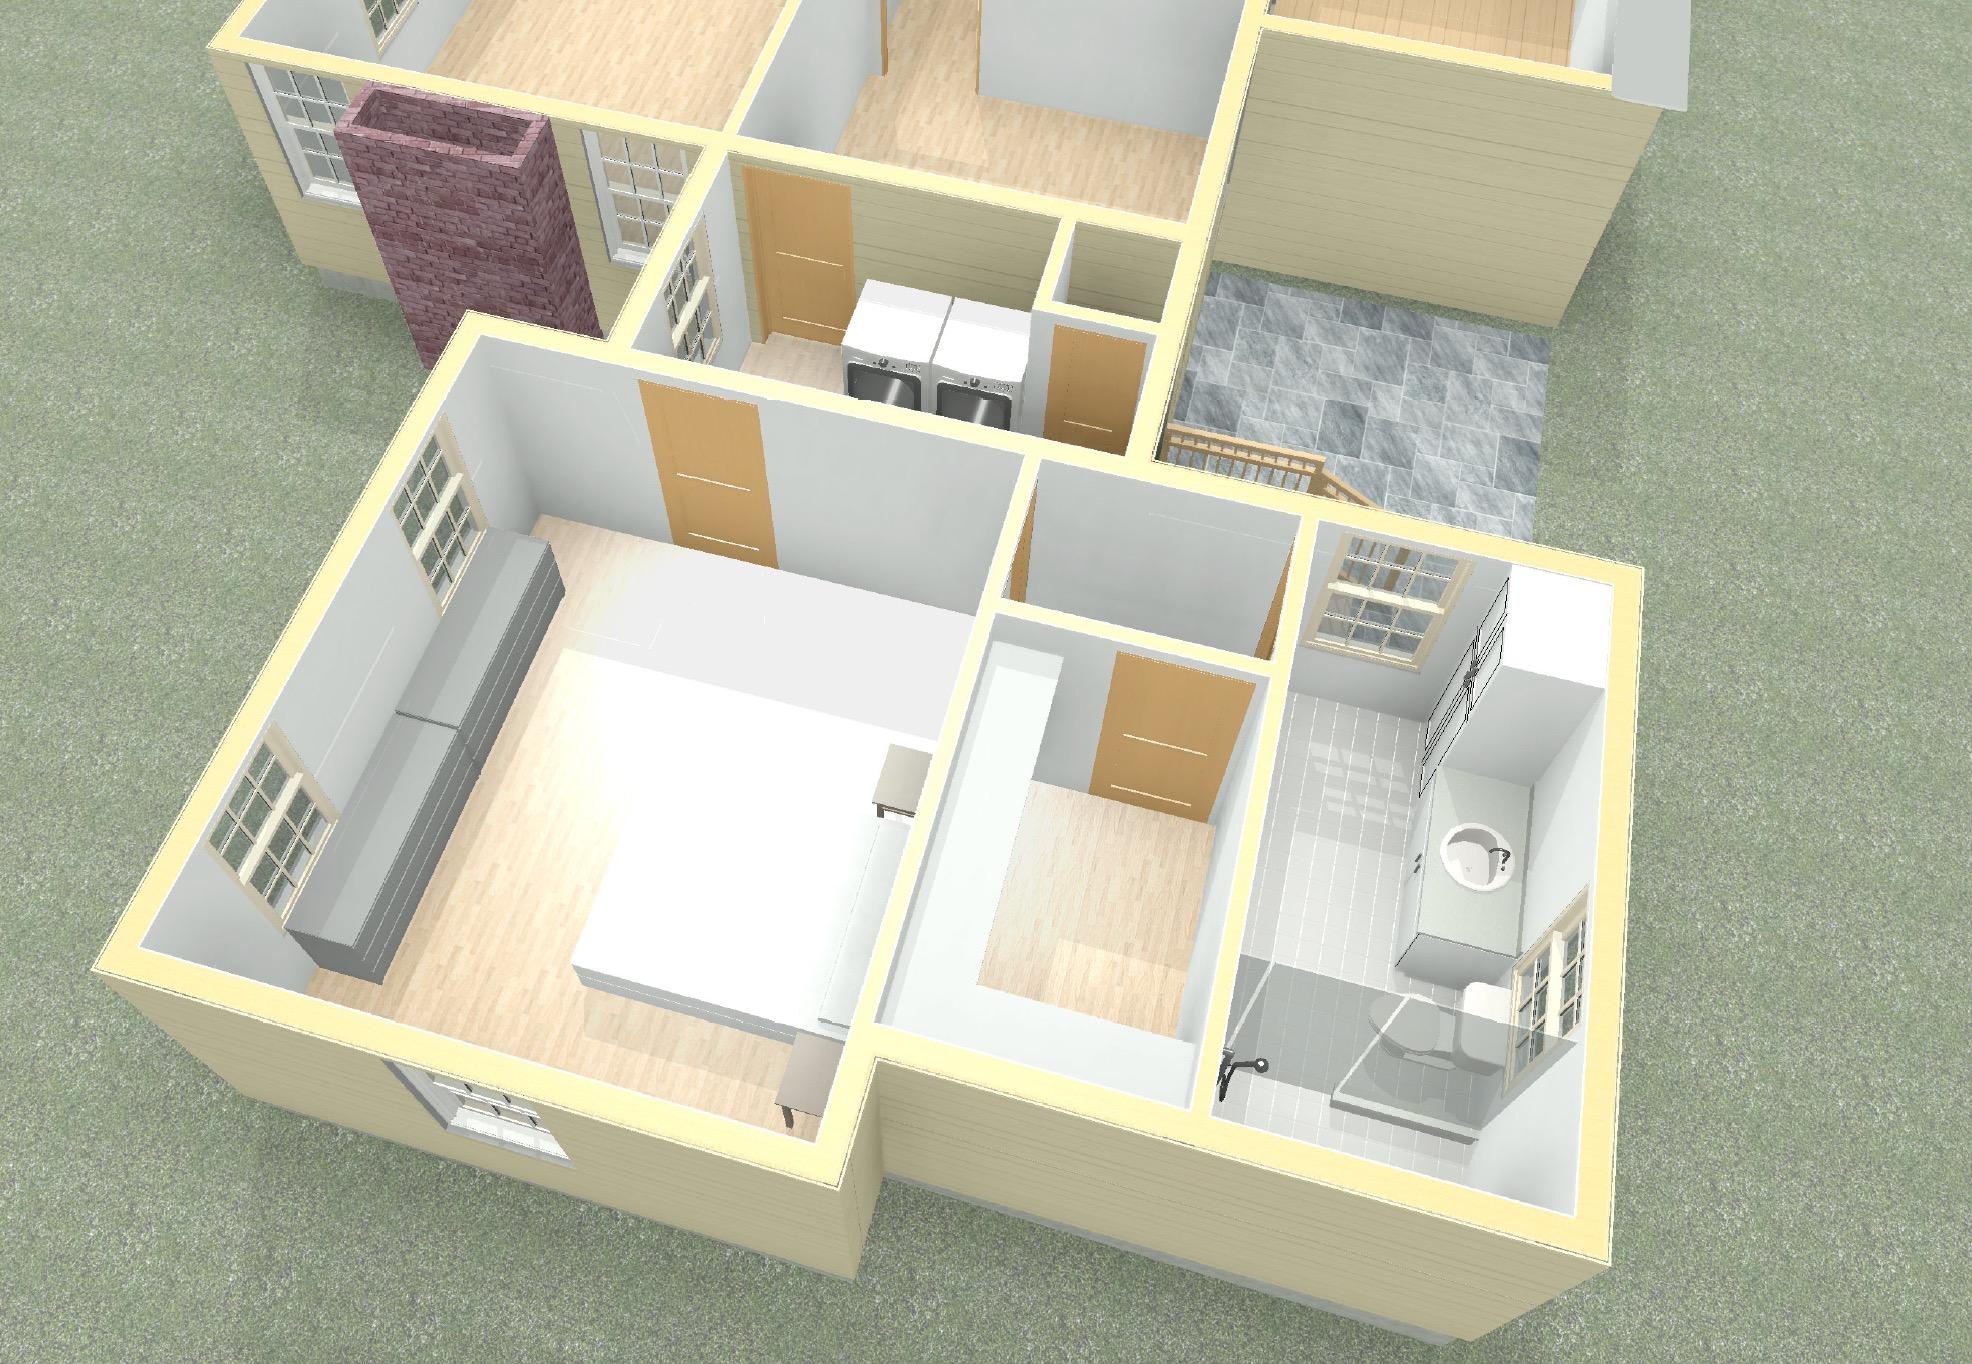 kittery-master-bedroom-floorplan.JPG